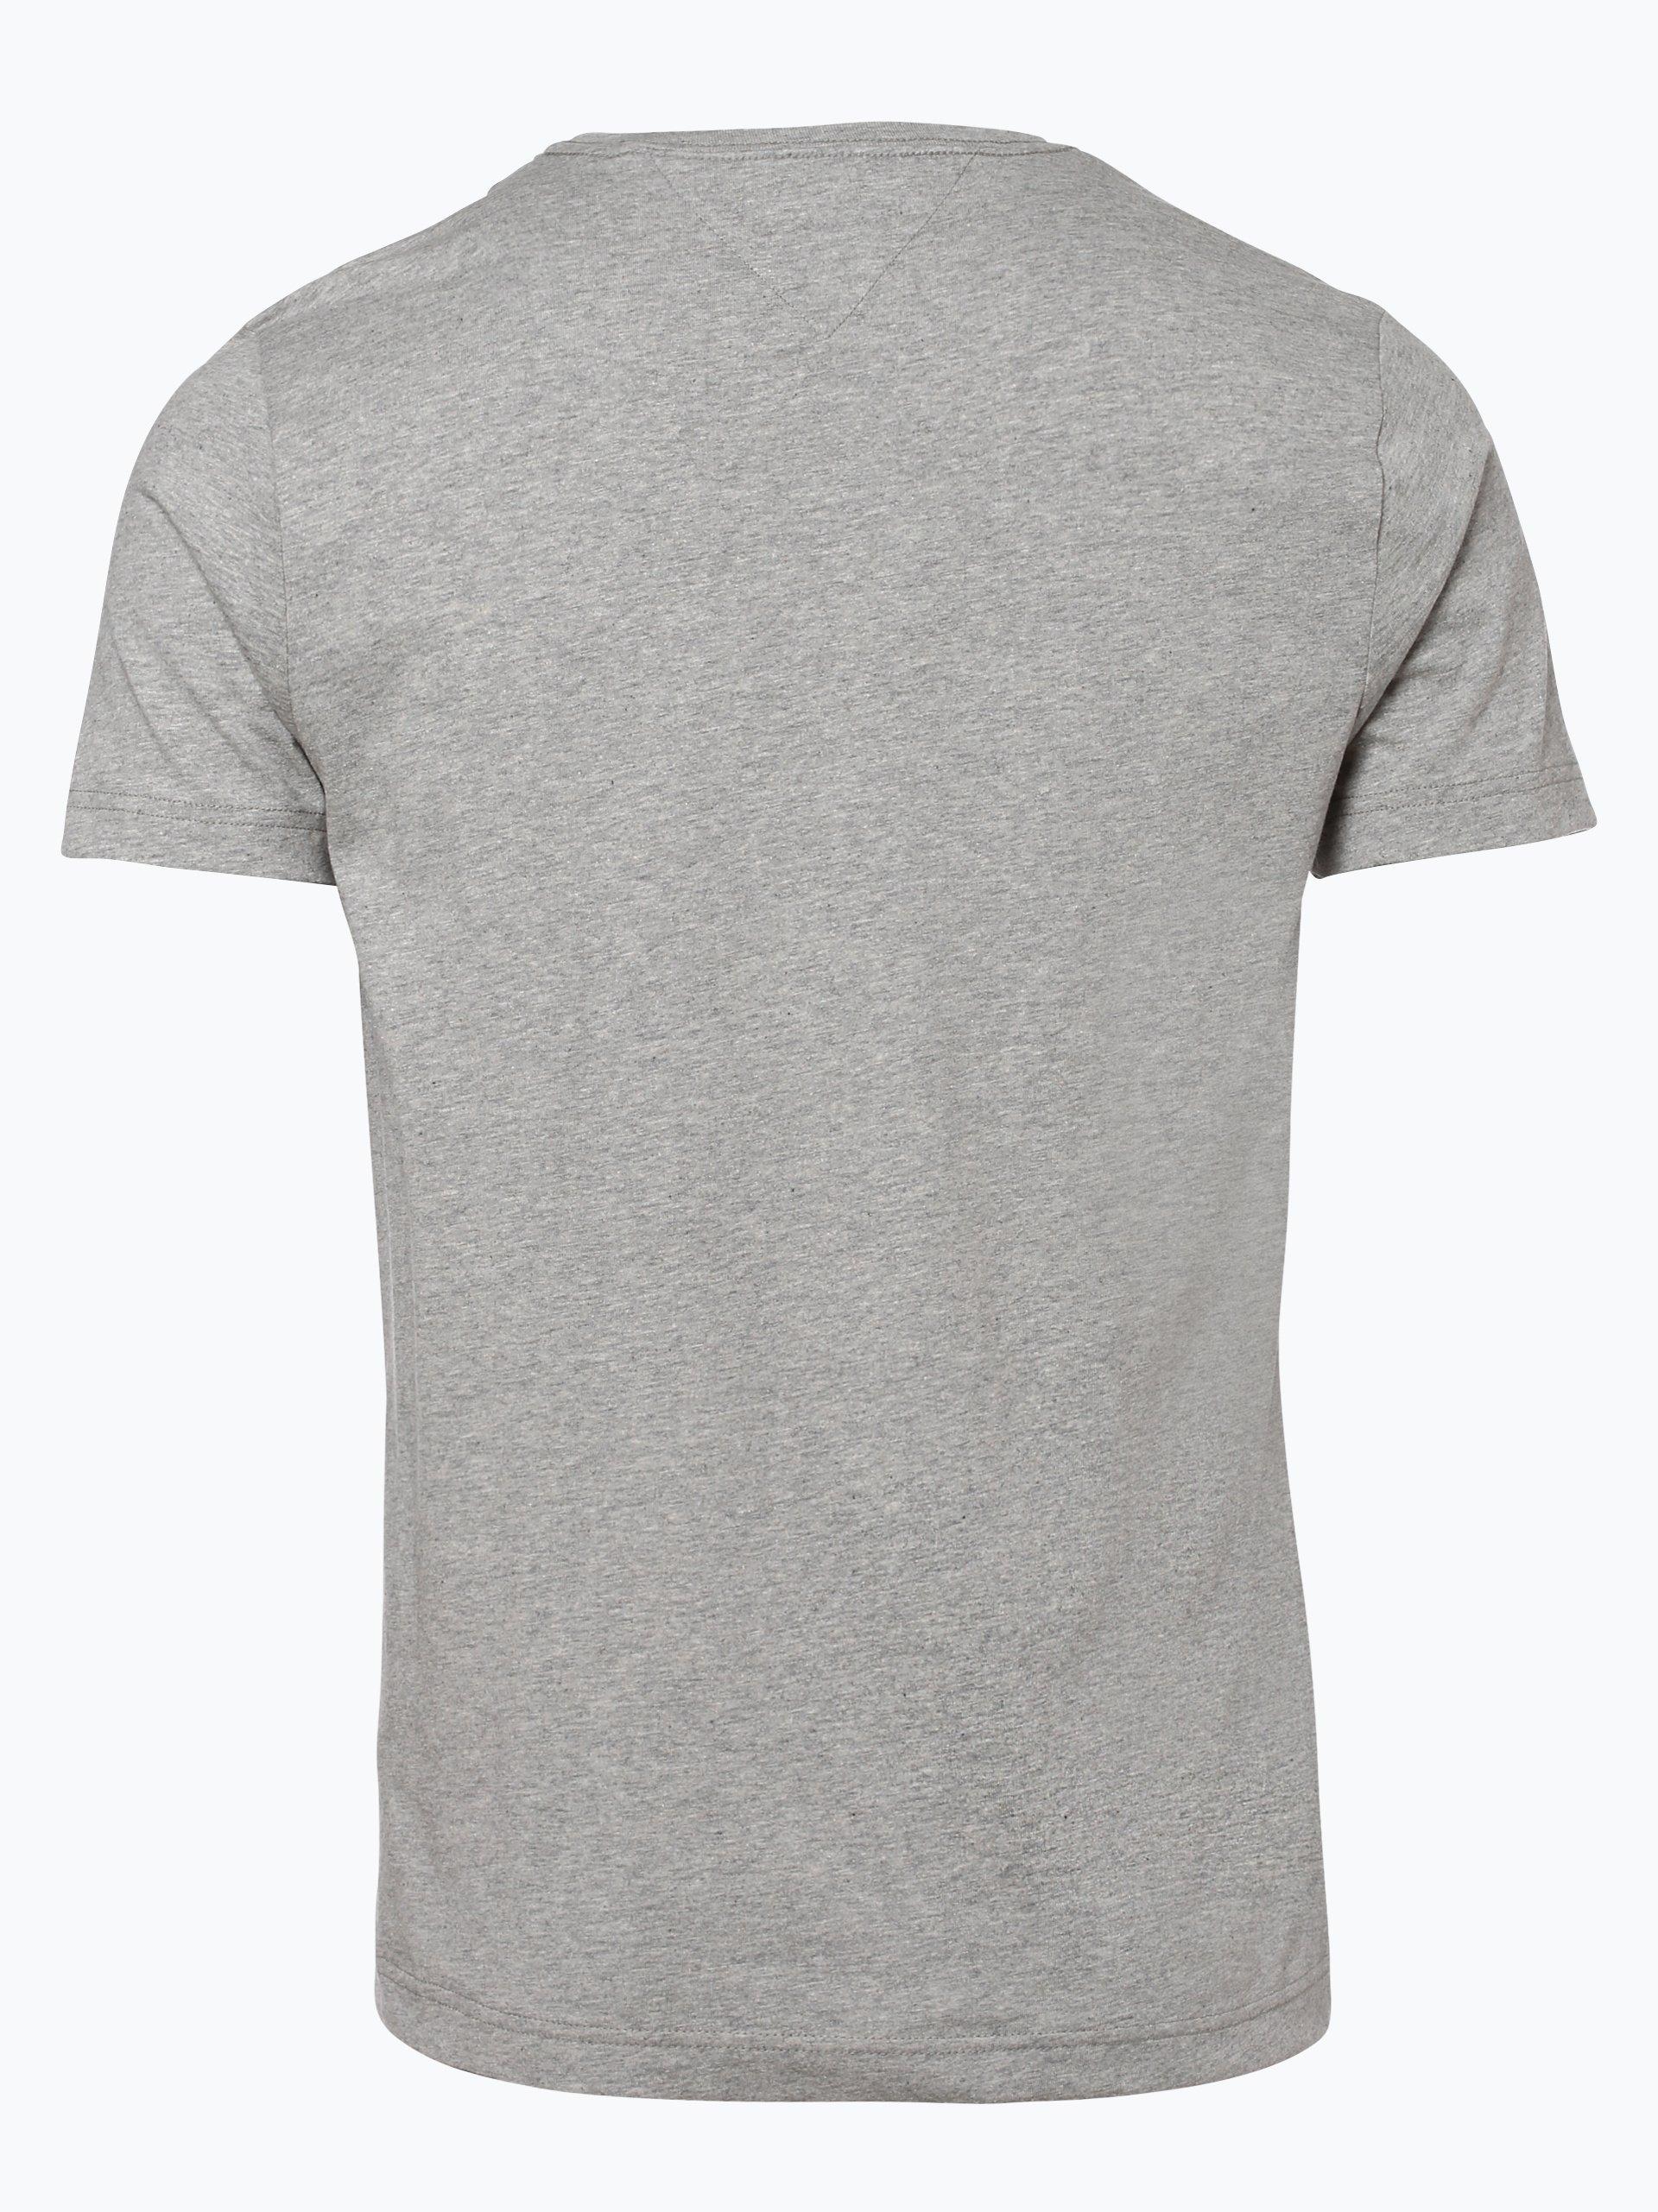 tommy hilfiger herren t shirt grau gemustert online kaufen. Black Bedroom Furniture Sets. Home Design Ideas